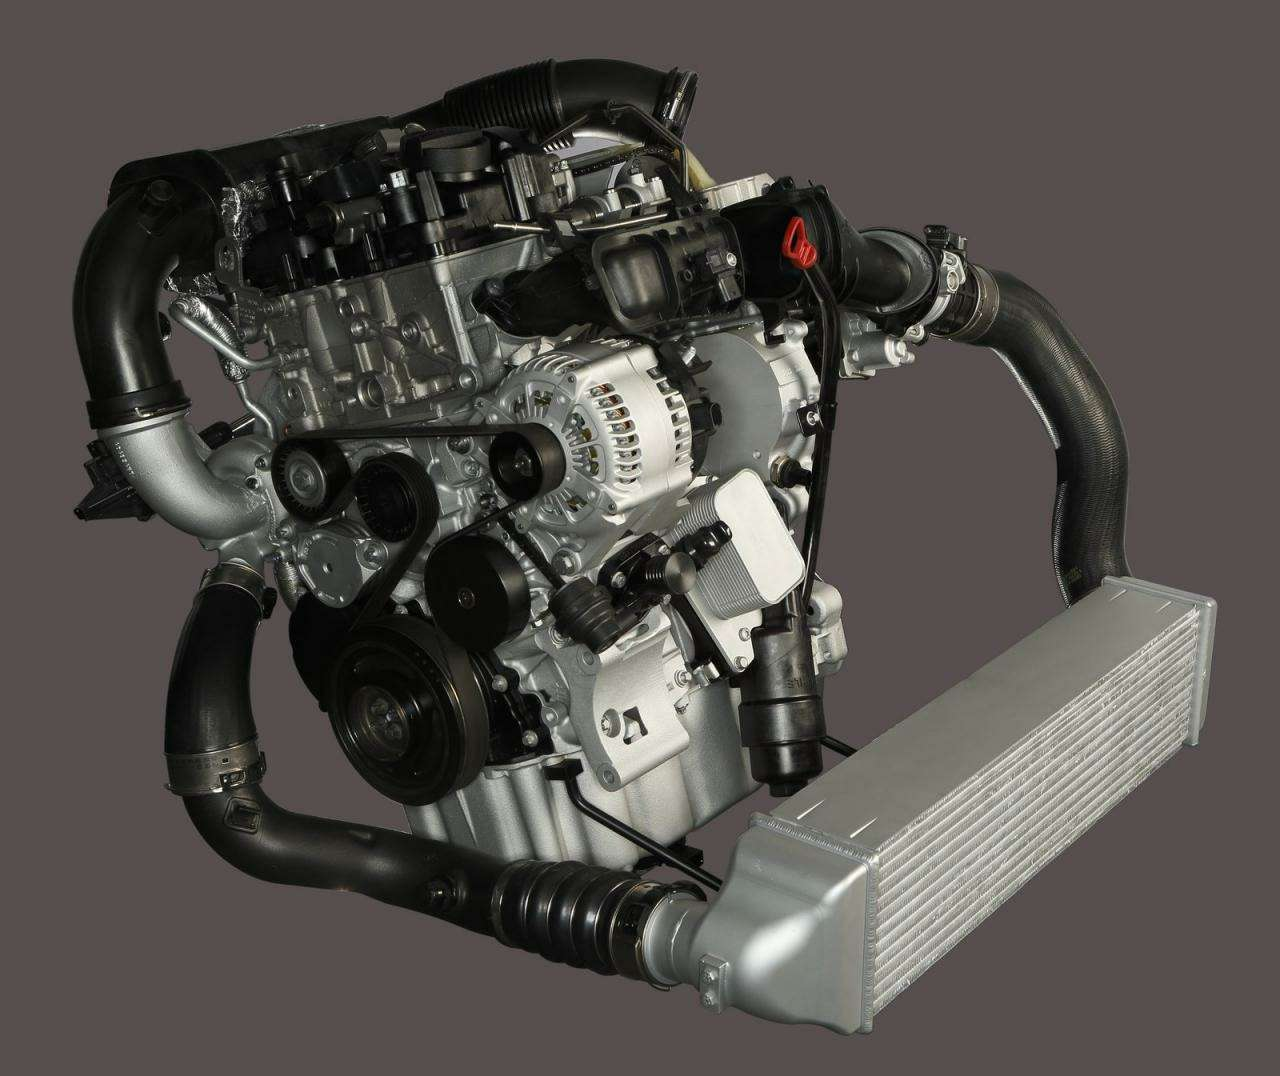 BMW1.5-liter TwinPower Turbo engine 1_no_copyright